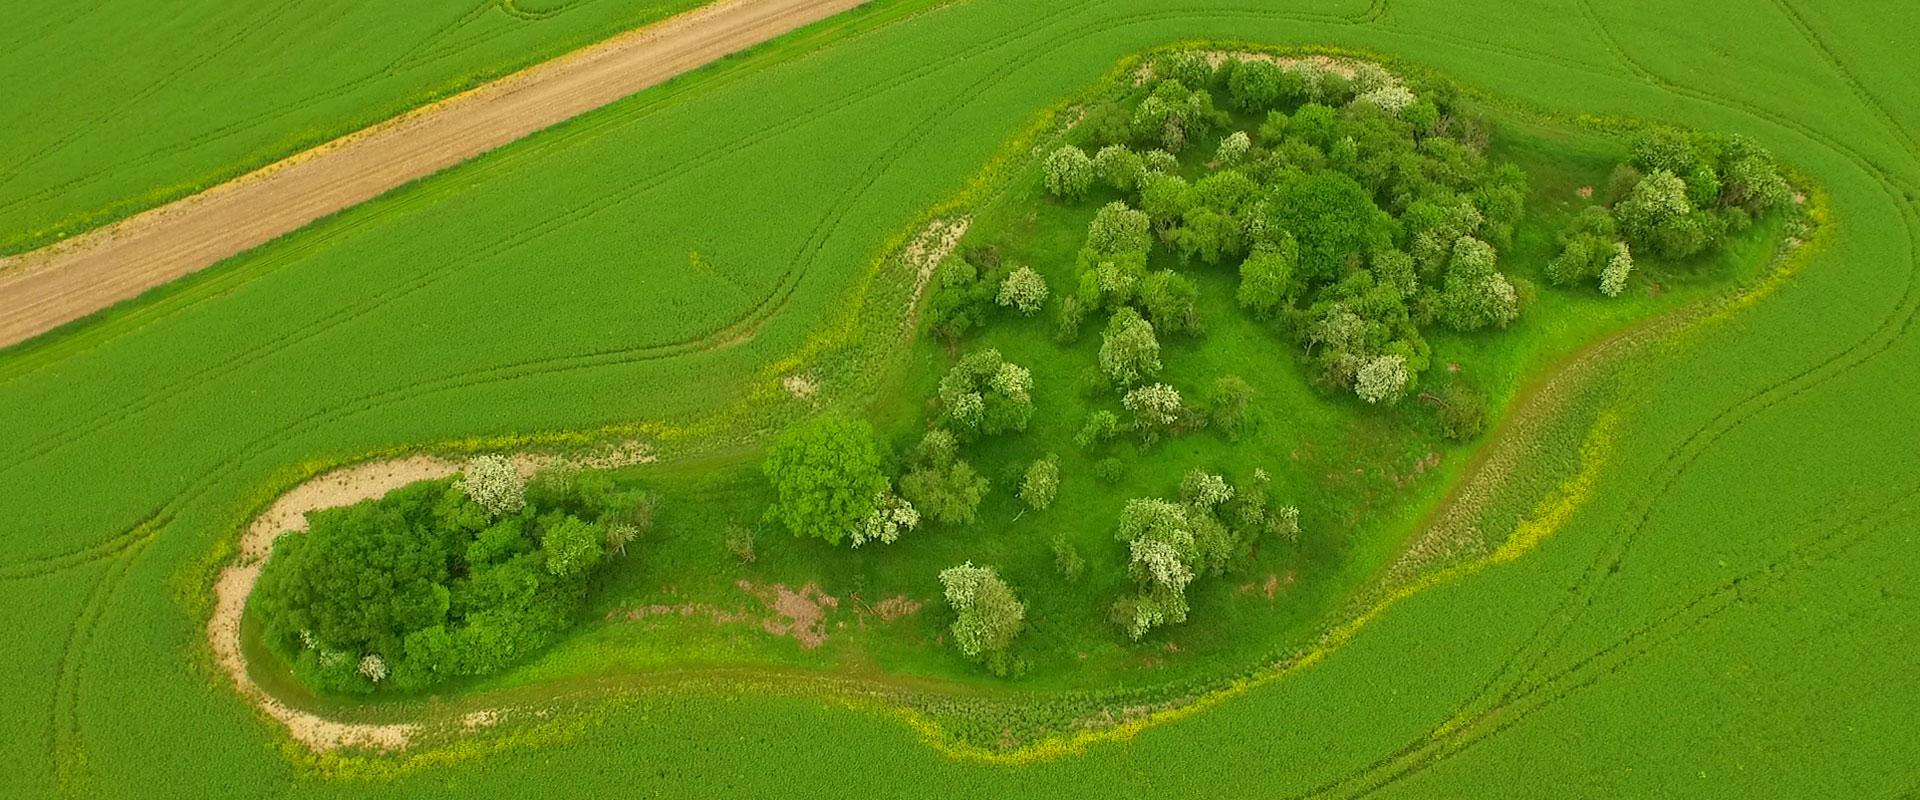 Green-footprint-8.jpg